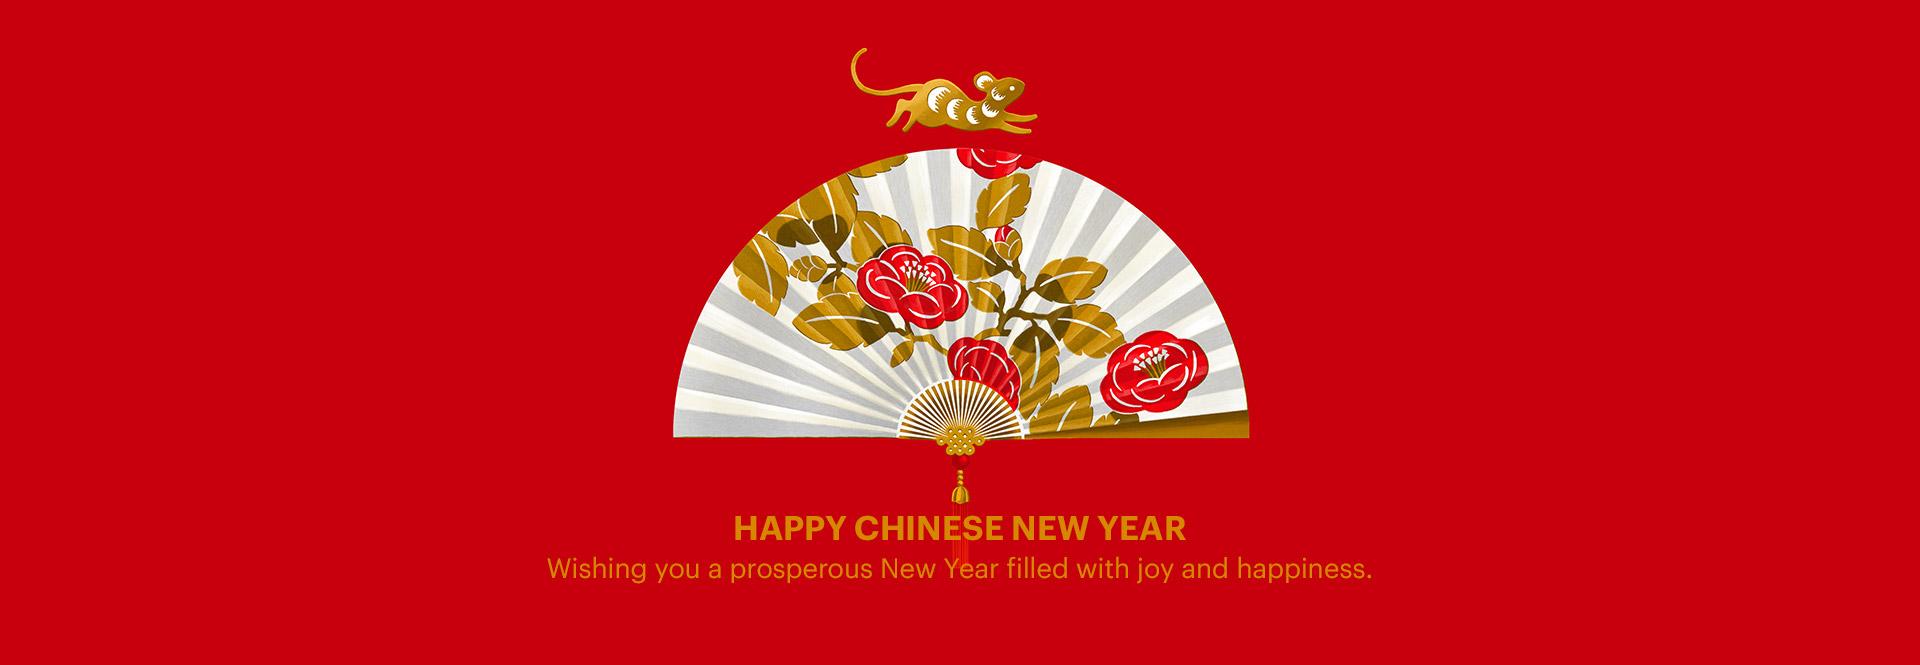 Chinese New Year 2020 - ตรุษจีน